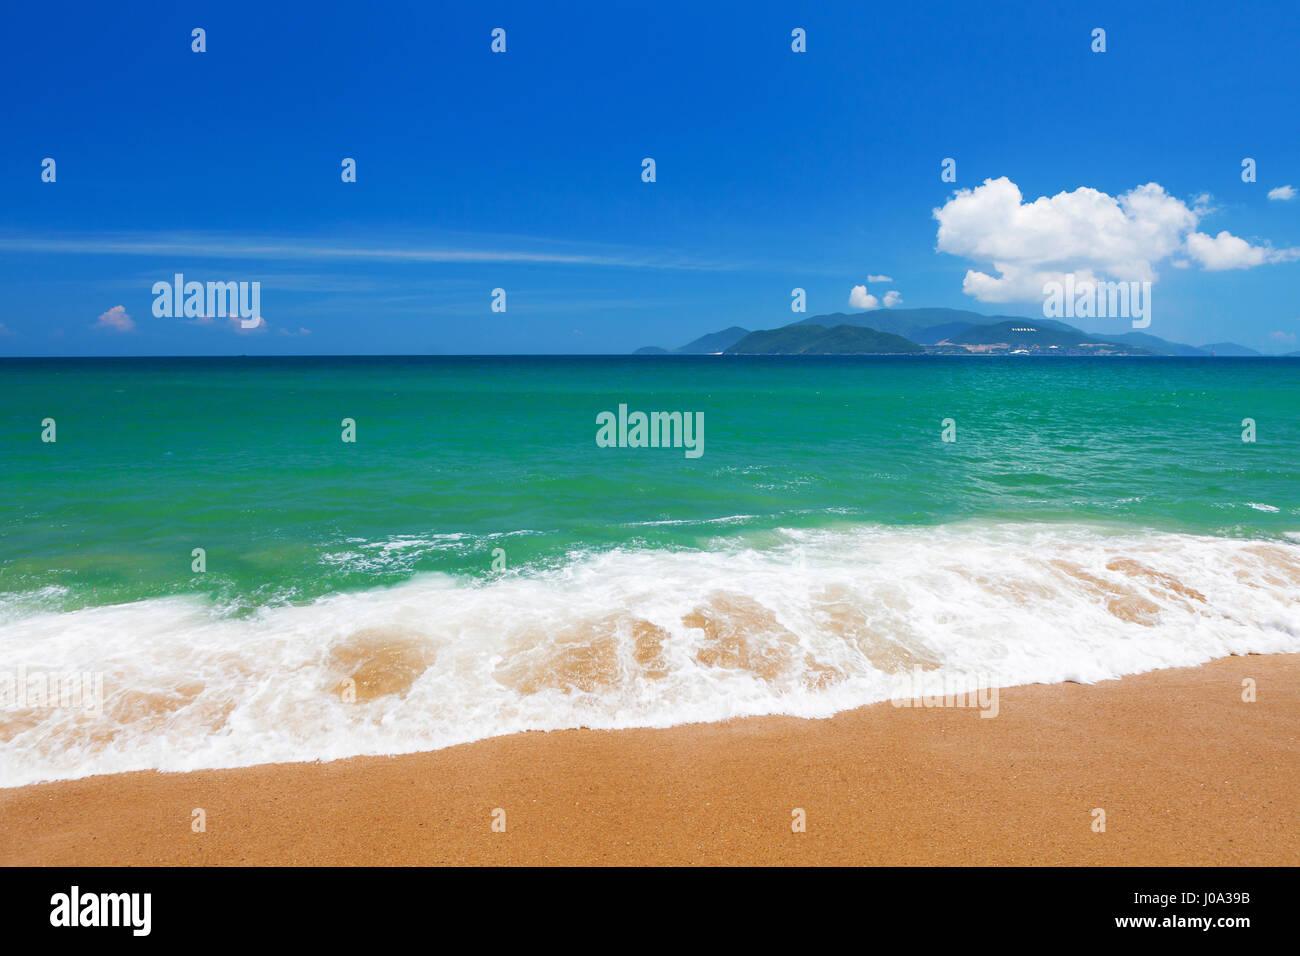 Clear blue sky over emerald South China Sea, Nha Trang, Khanh Hoa province, Vietnam - Stock Image